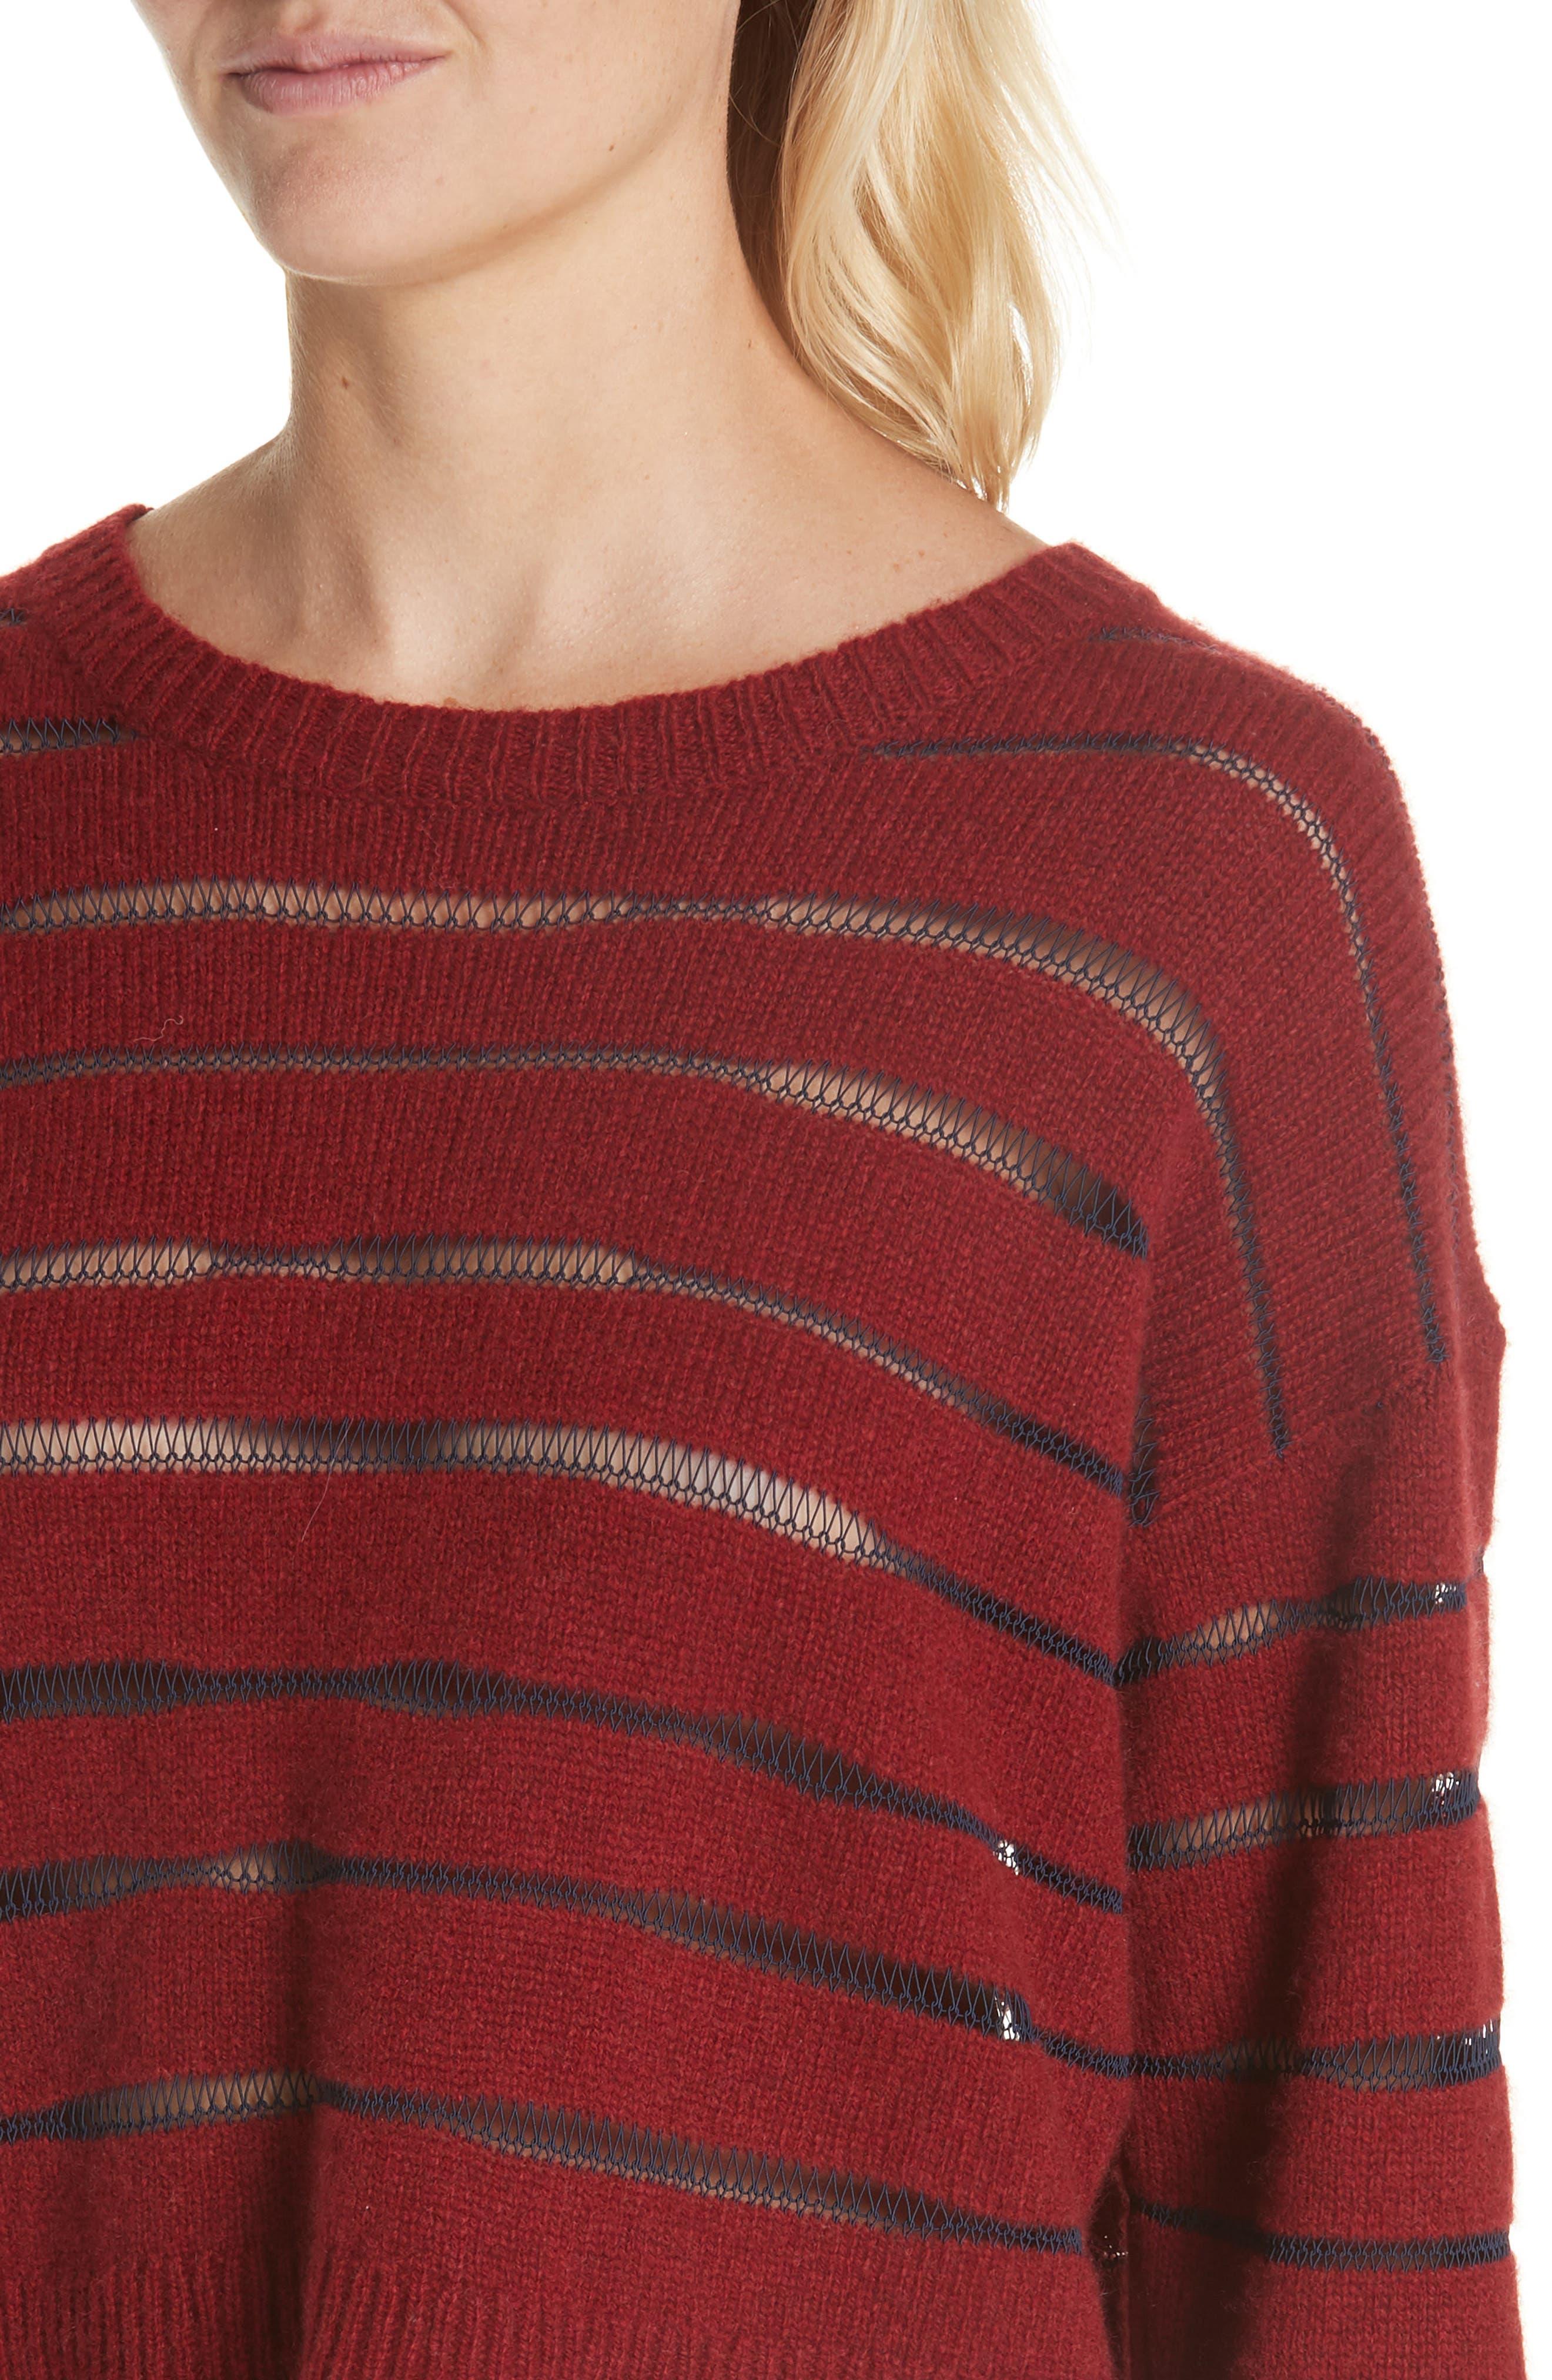 Penn Sheer Stripe Crop Sweater,                             Alternate thumbnail 4, color,                             068